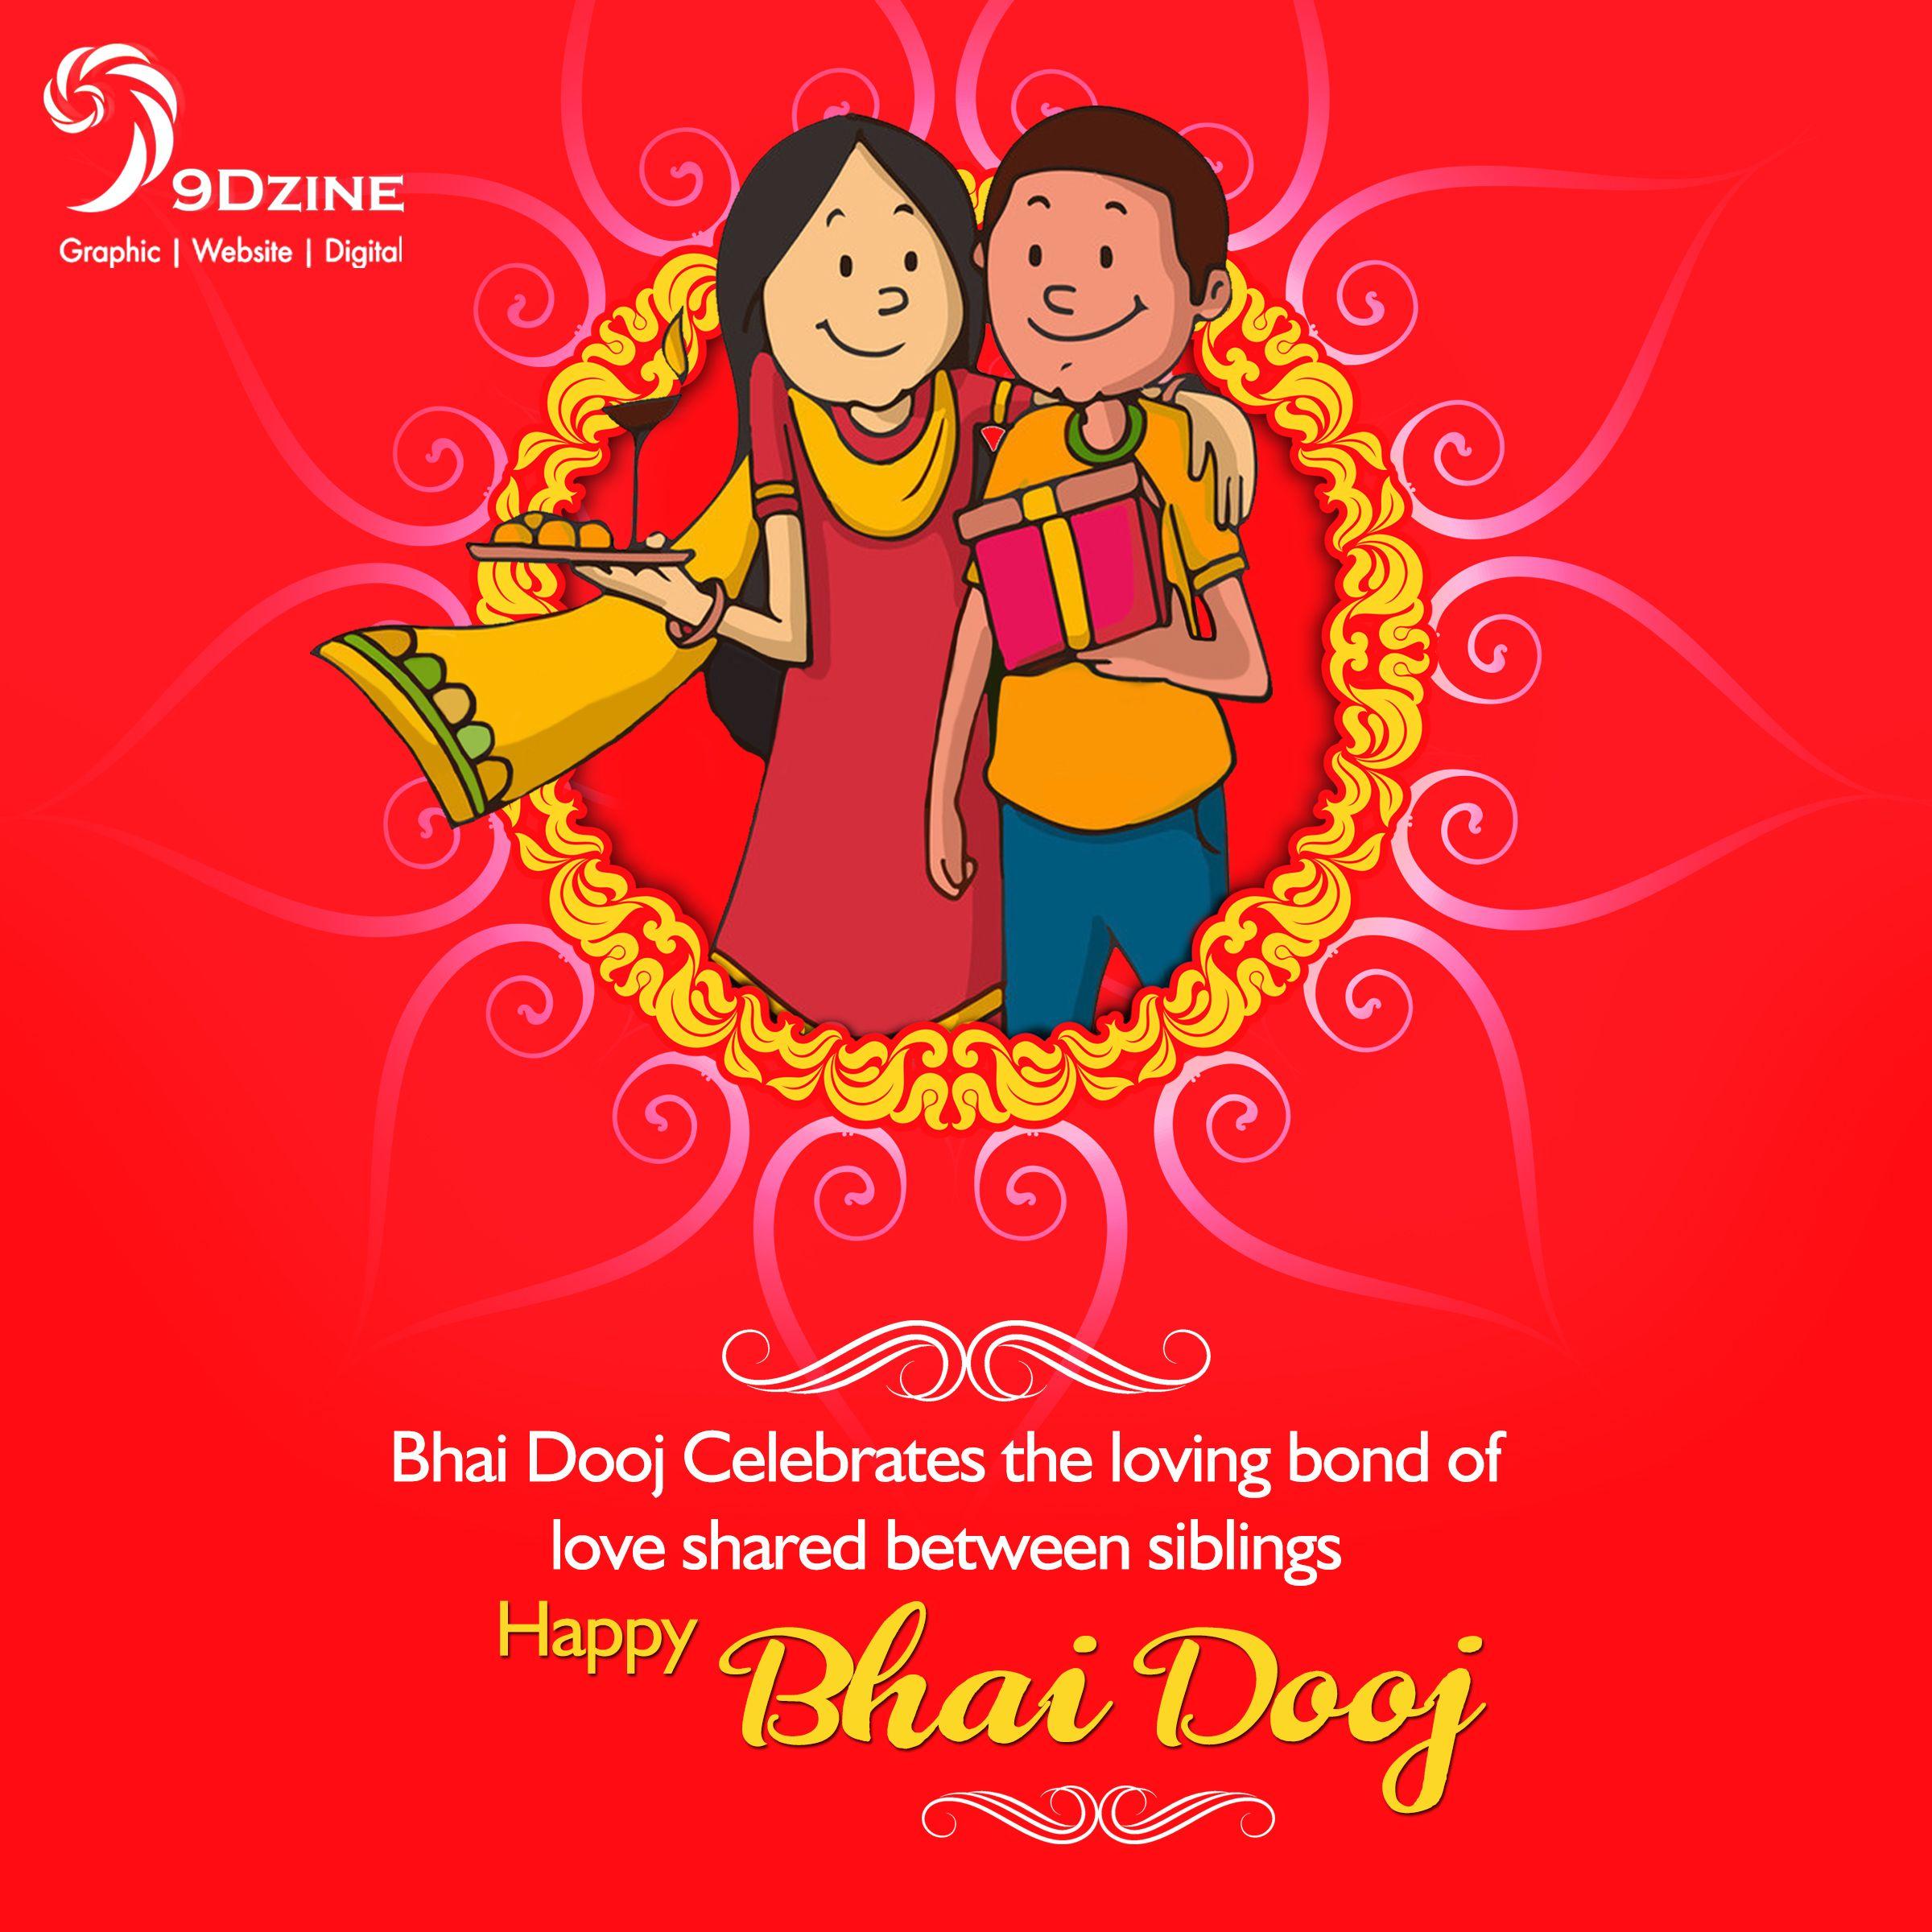 Bhai Dooj Celebrates The Loving Bond Of Love Shared Between Siblings